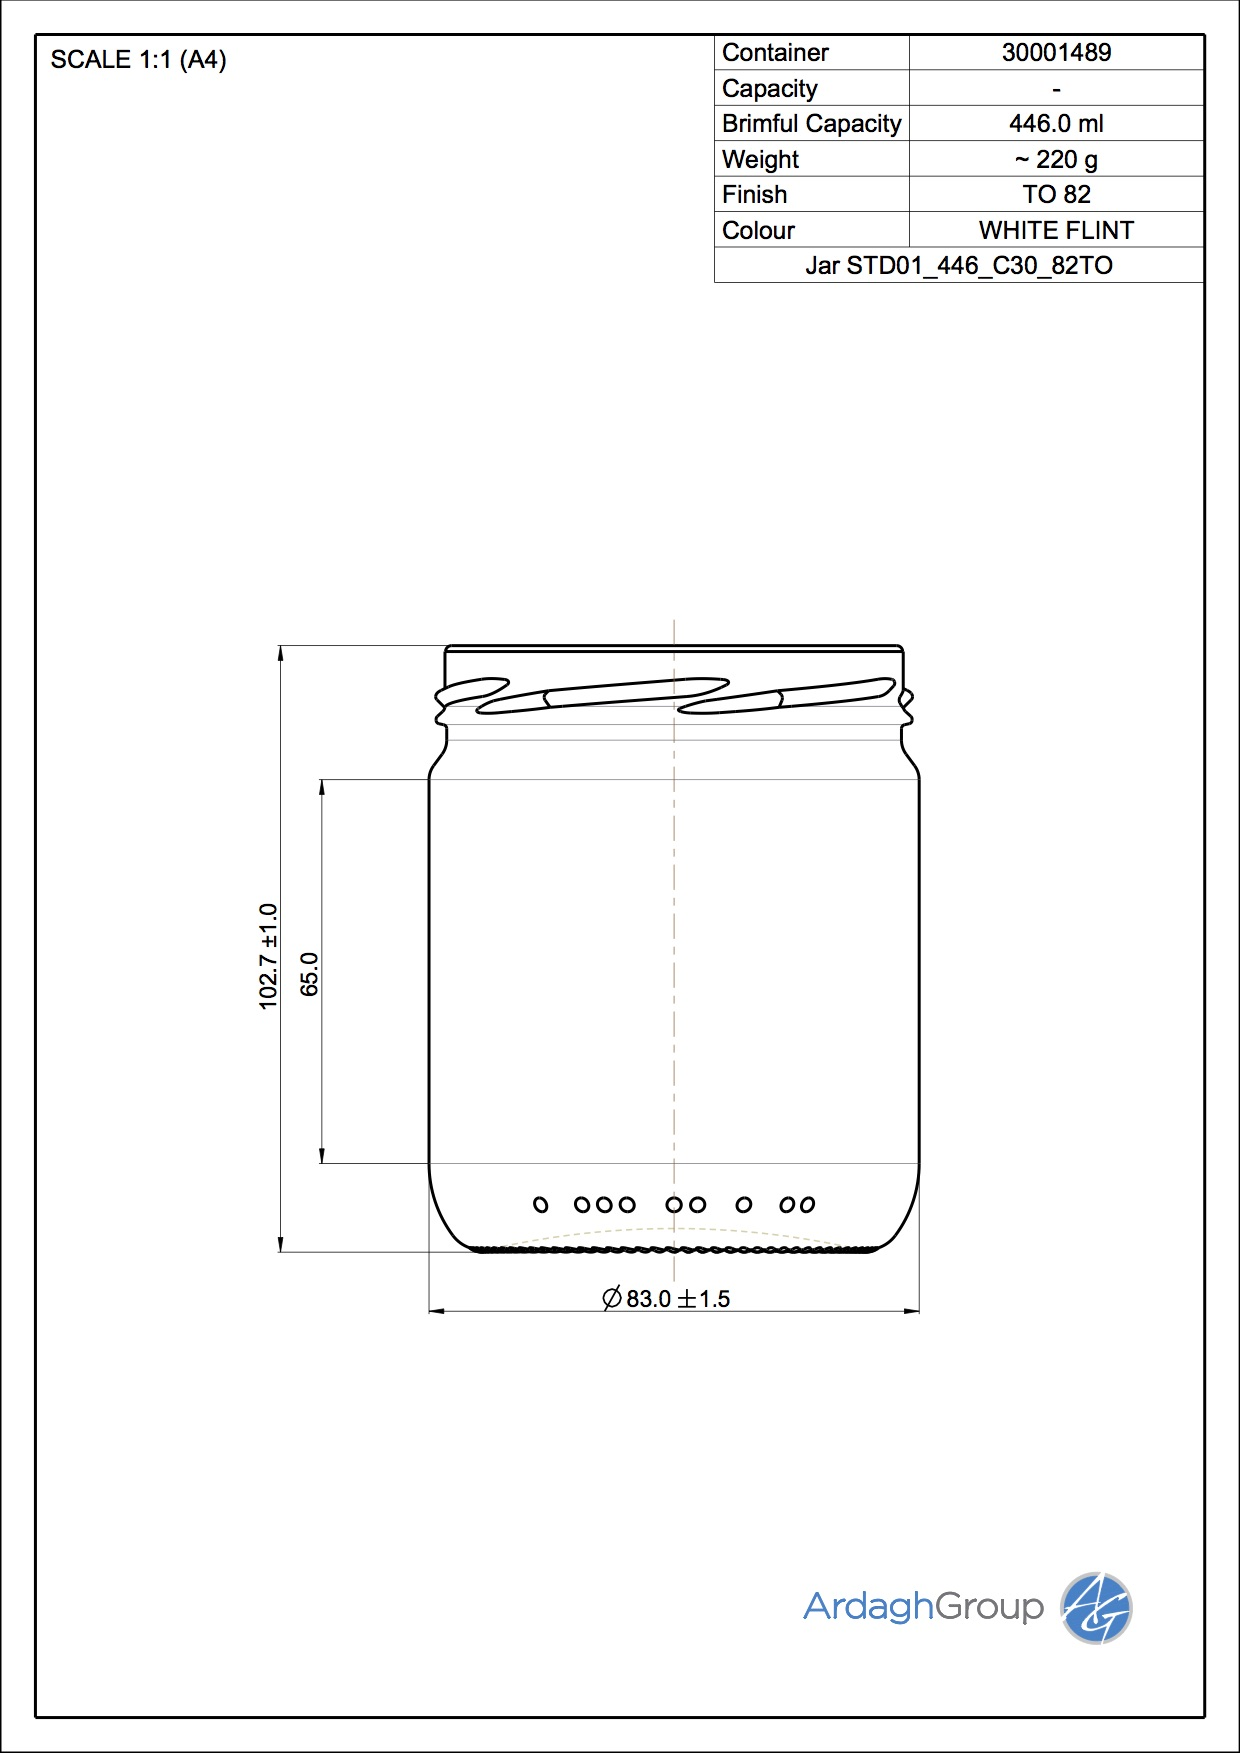 Jar STD01 446 C30 82TO